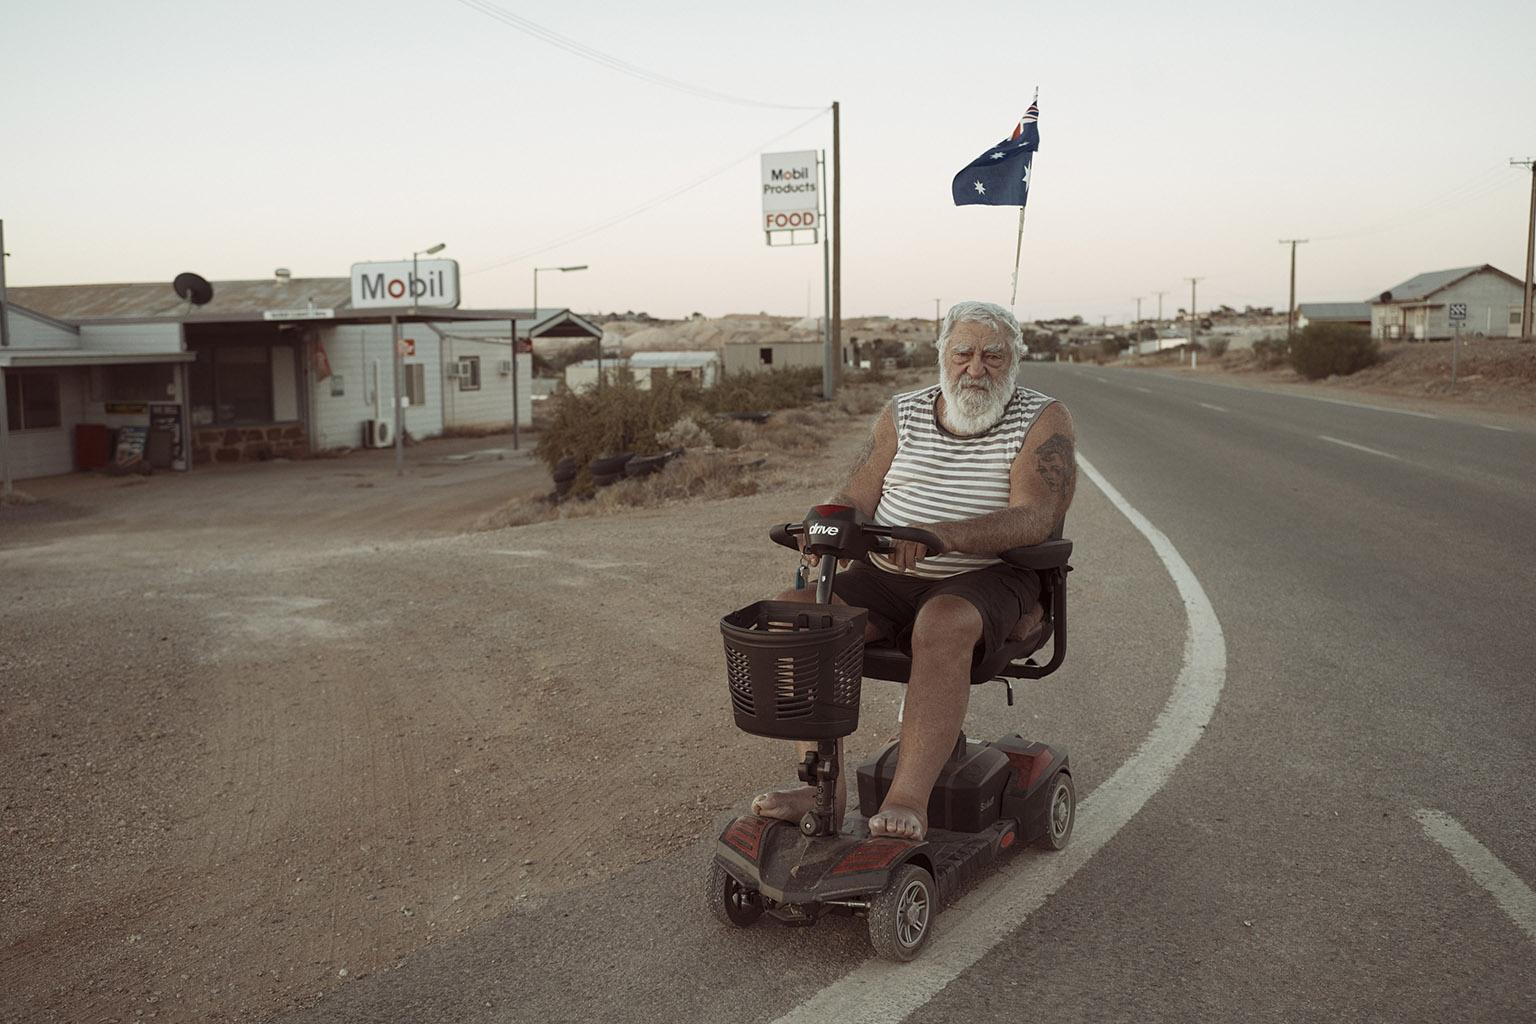 Award-winning Australian short documentary 'Rear View Mirror' set in Andamooka launches